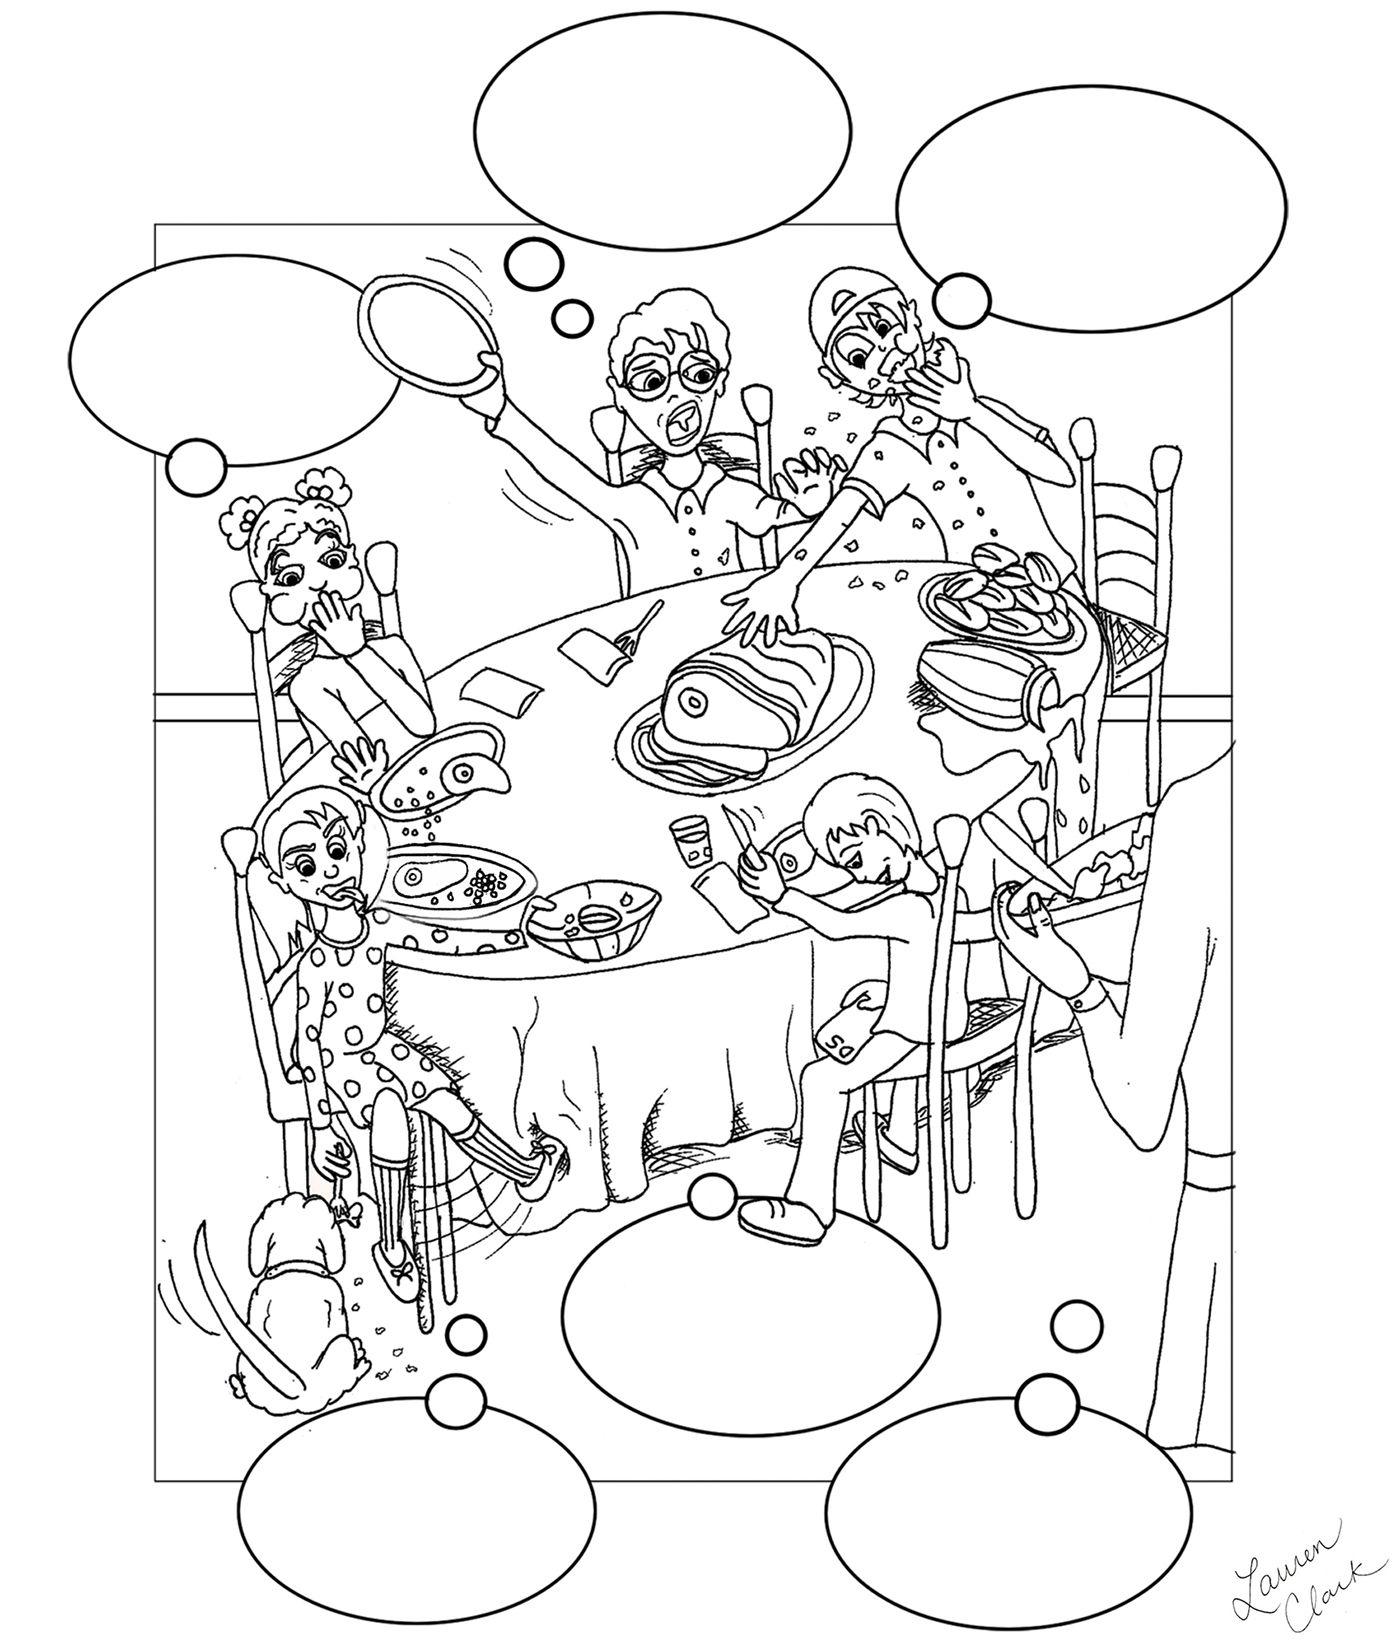 Illustration Created For Pompton Speech Plus A Center